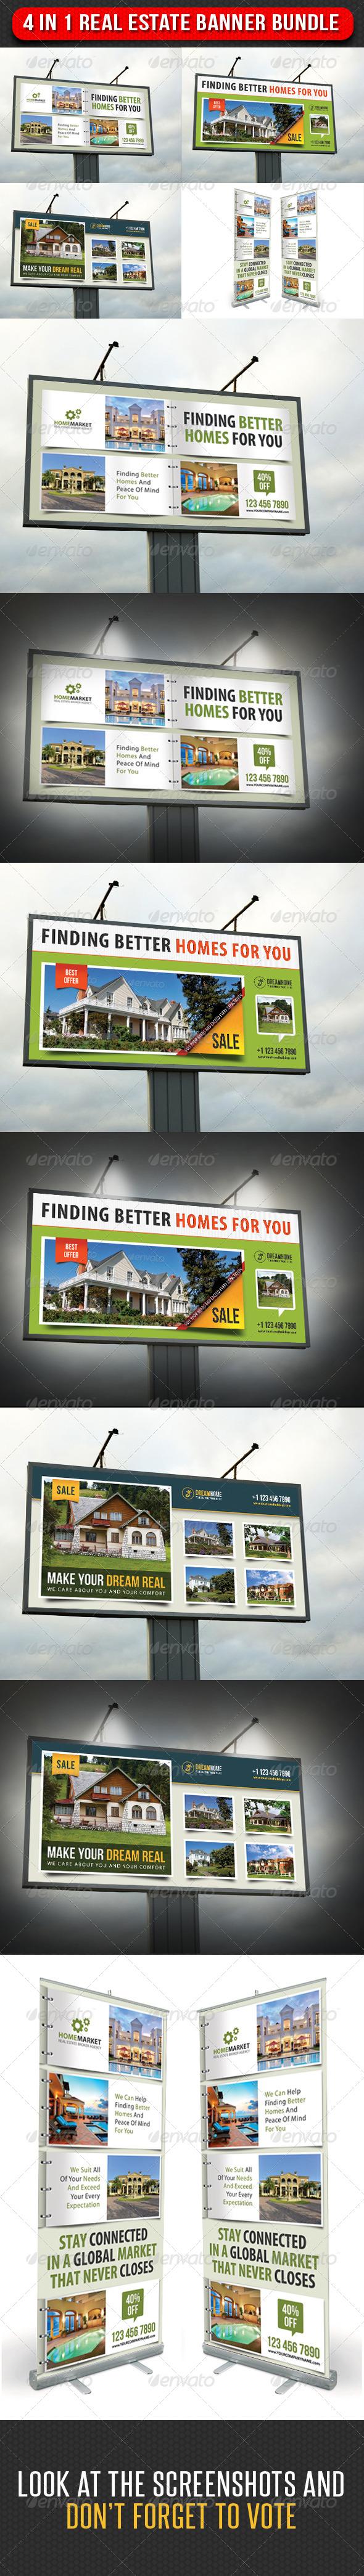 4 in 1 Real Estate Banner Bundle 03 - Signage Print Templates